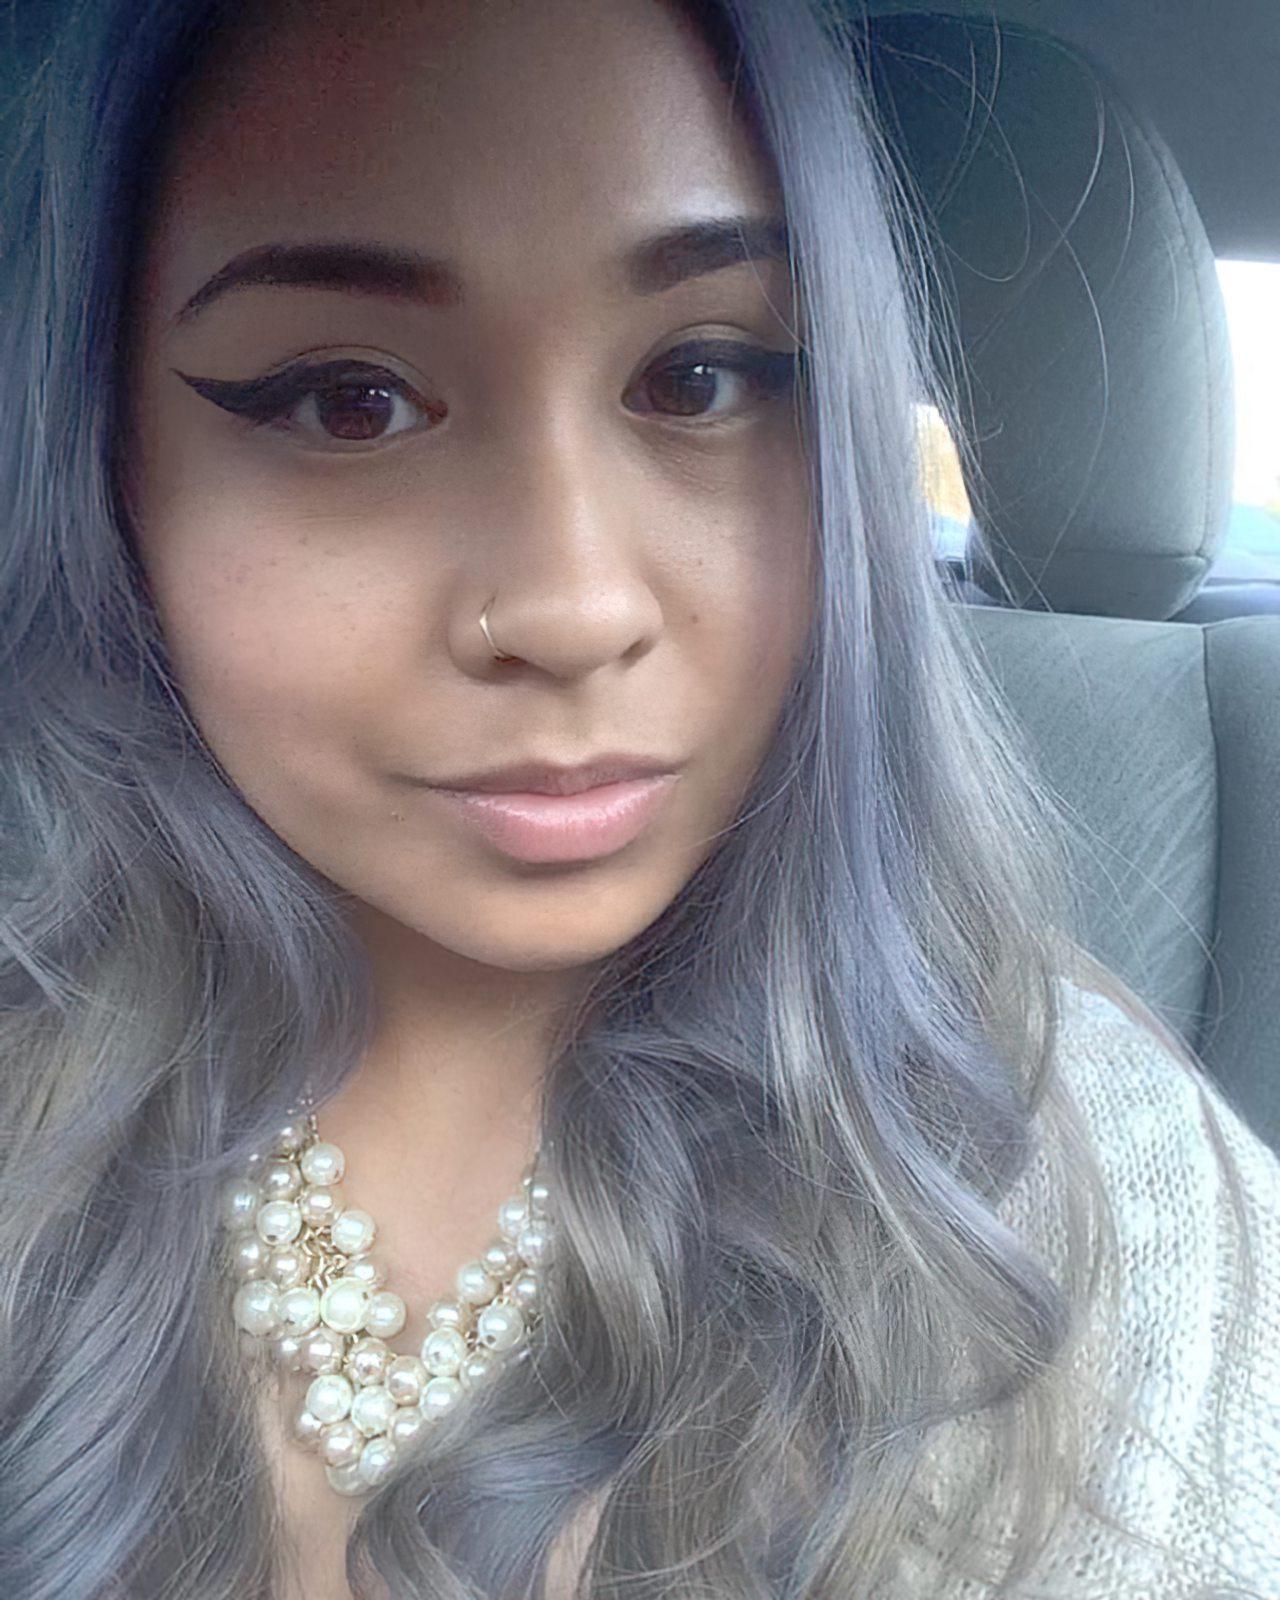 Moças Nuas (31)